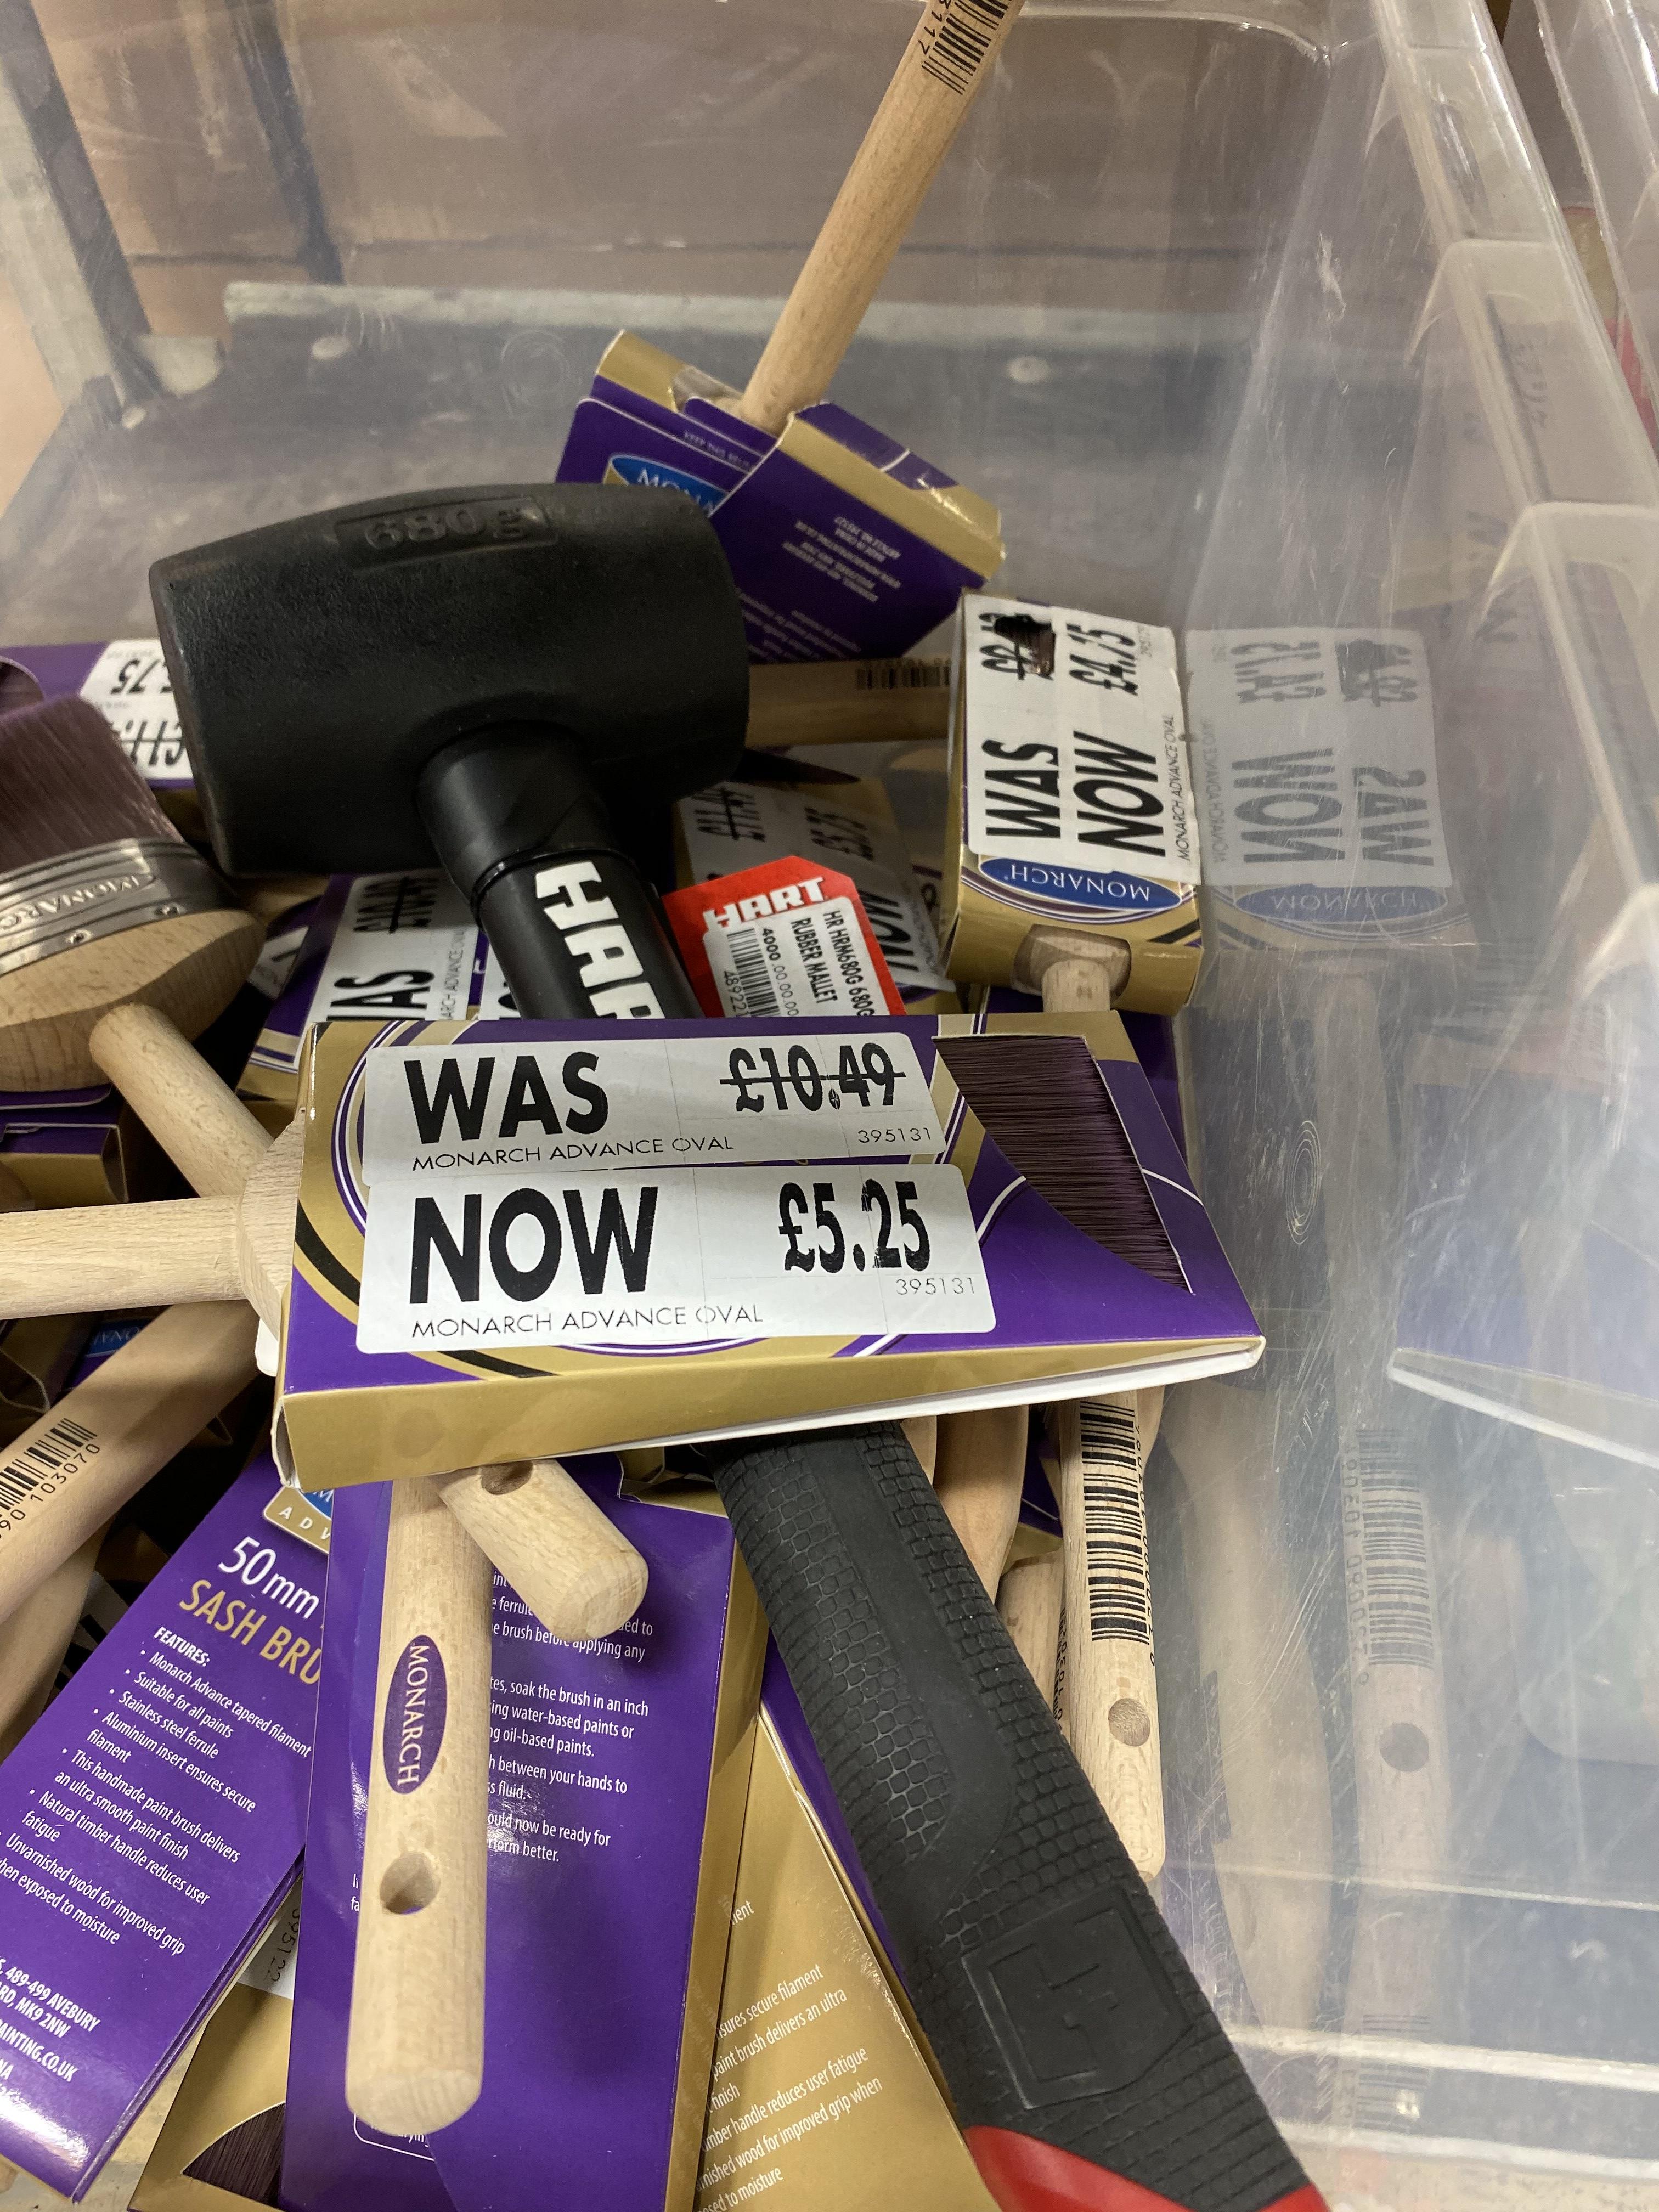 Monarch advance brushes half price Homebase Saffron Walden £5.25 instore